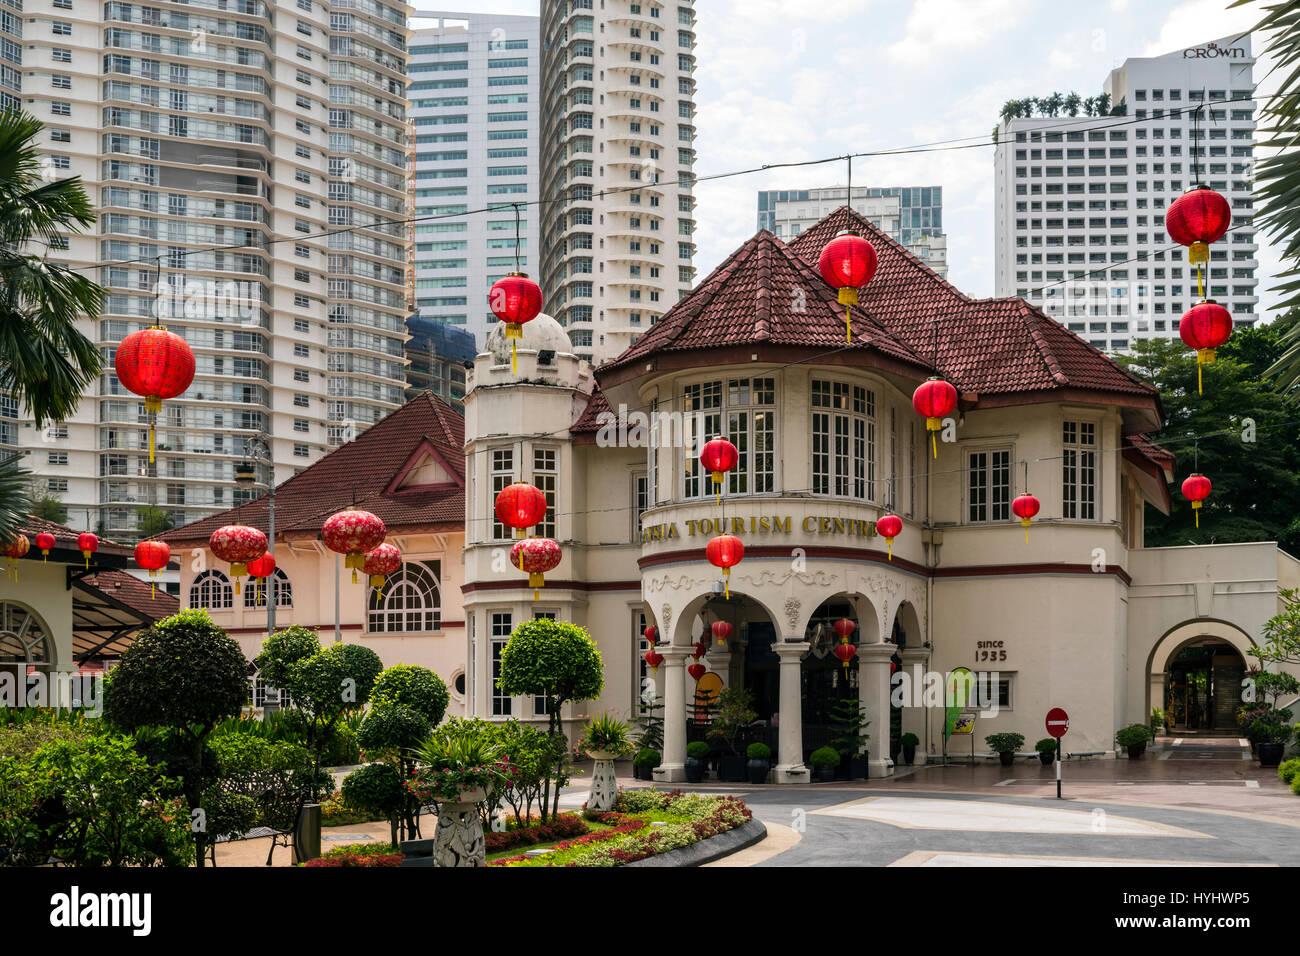 Malaysia Tourism Centre, Kuala Lumpur, Malaysia Stockbild